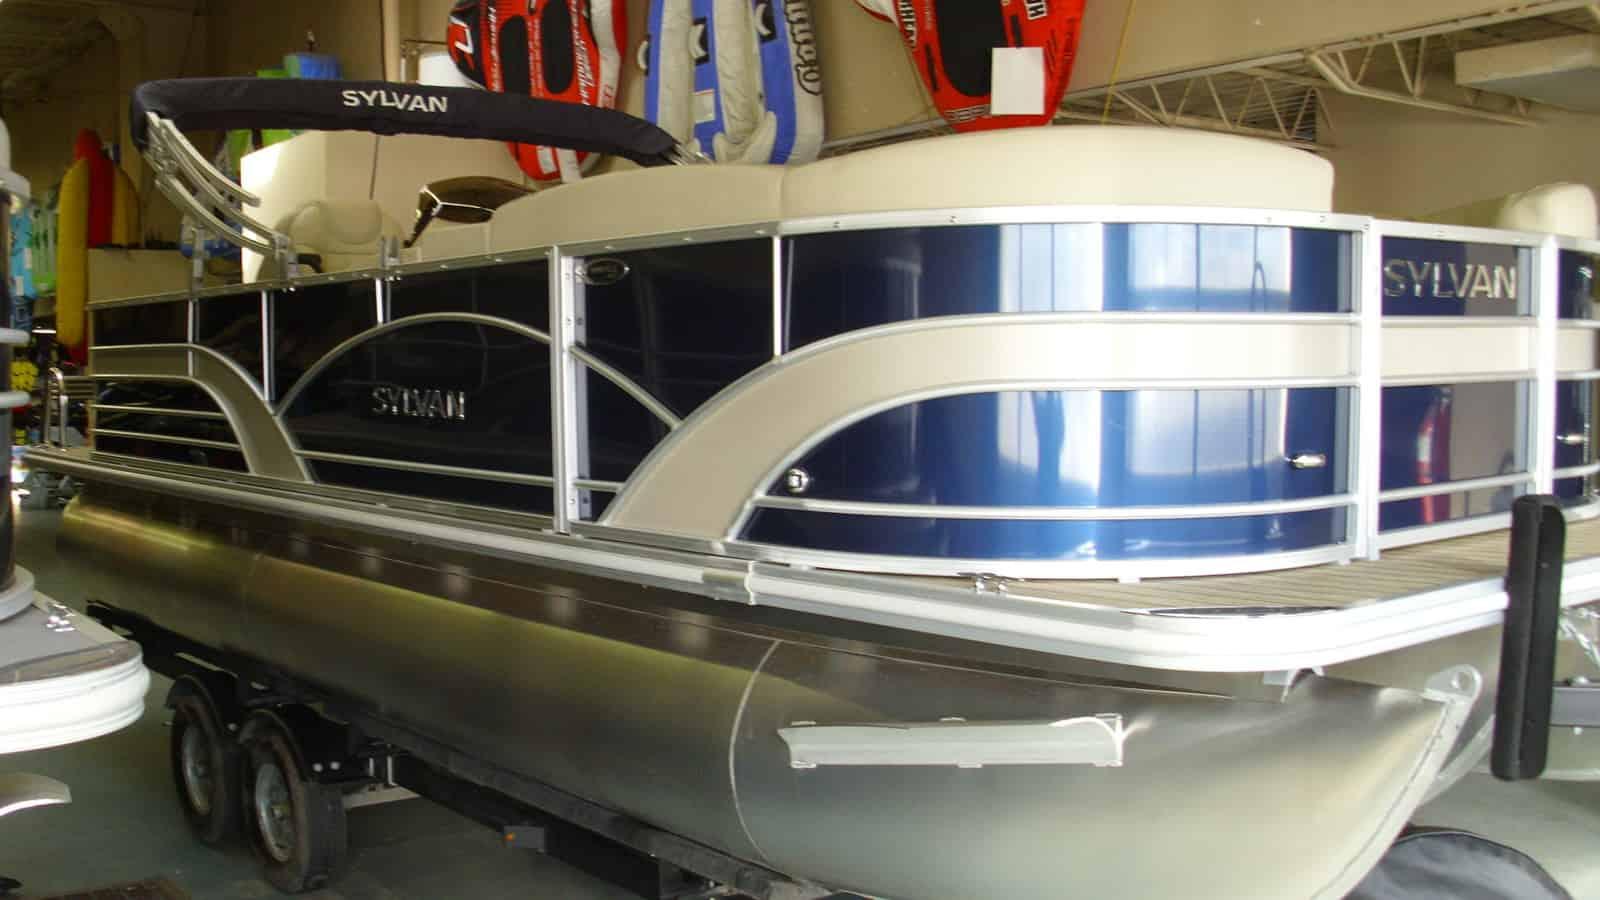 NEW 2019 Sylvan Mirage 8522 Cruise LE Tri Toon - Shipwreck Marine